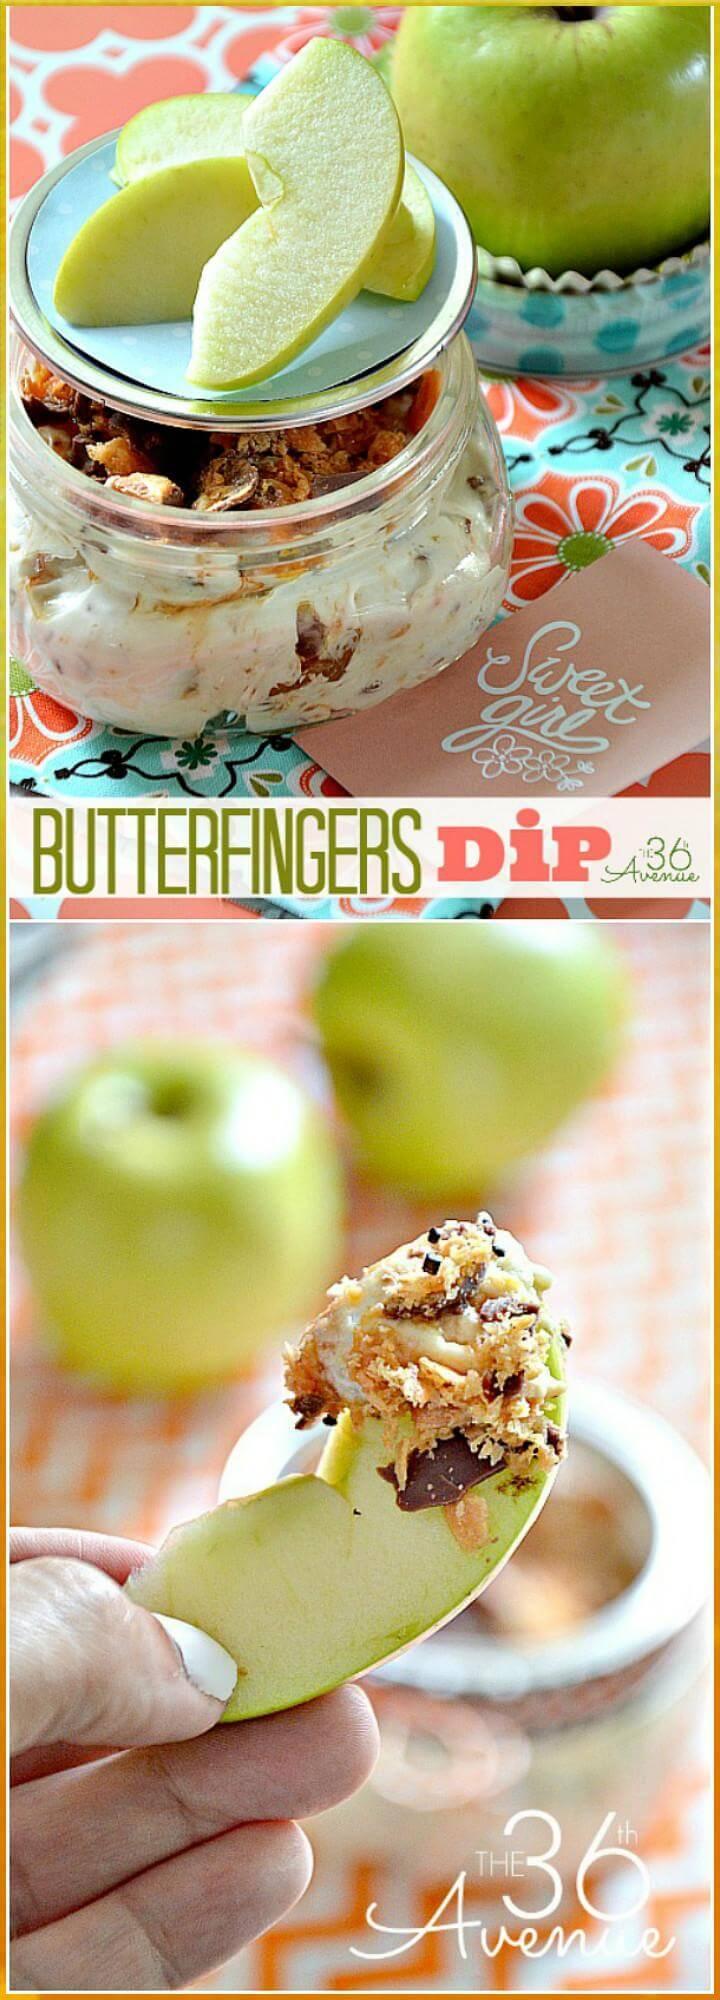 DIY butterfingers dip recipe